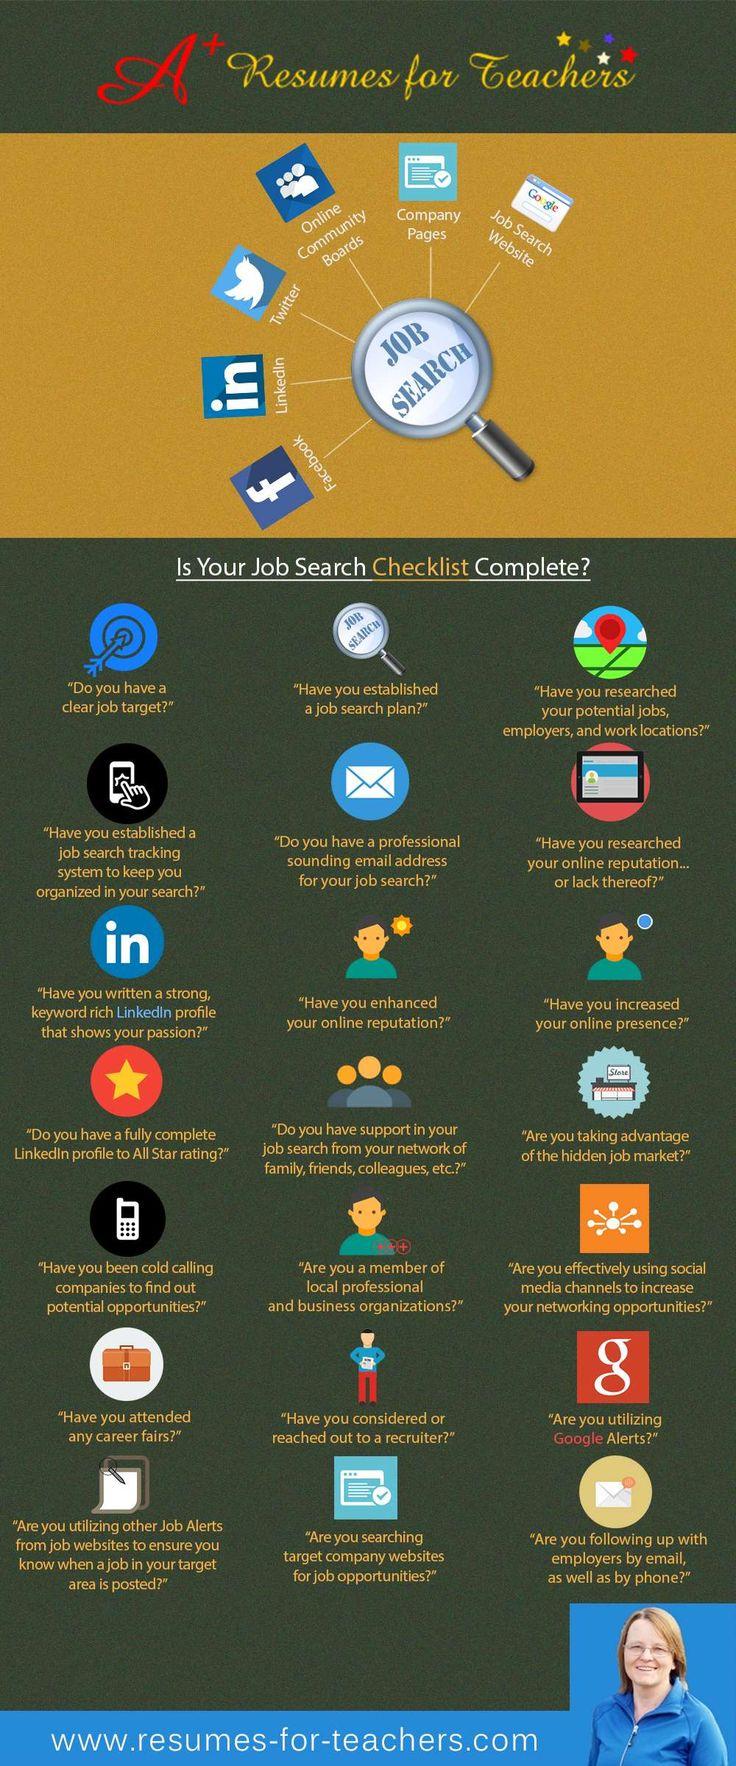 resumes for teachers com blog teaching job search tips a resumes for teachers com blog teaching